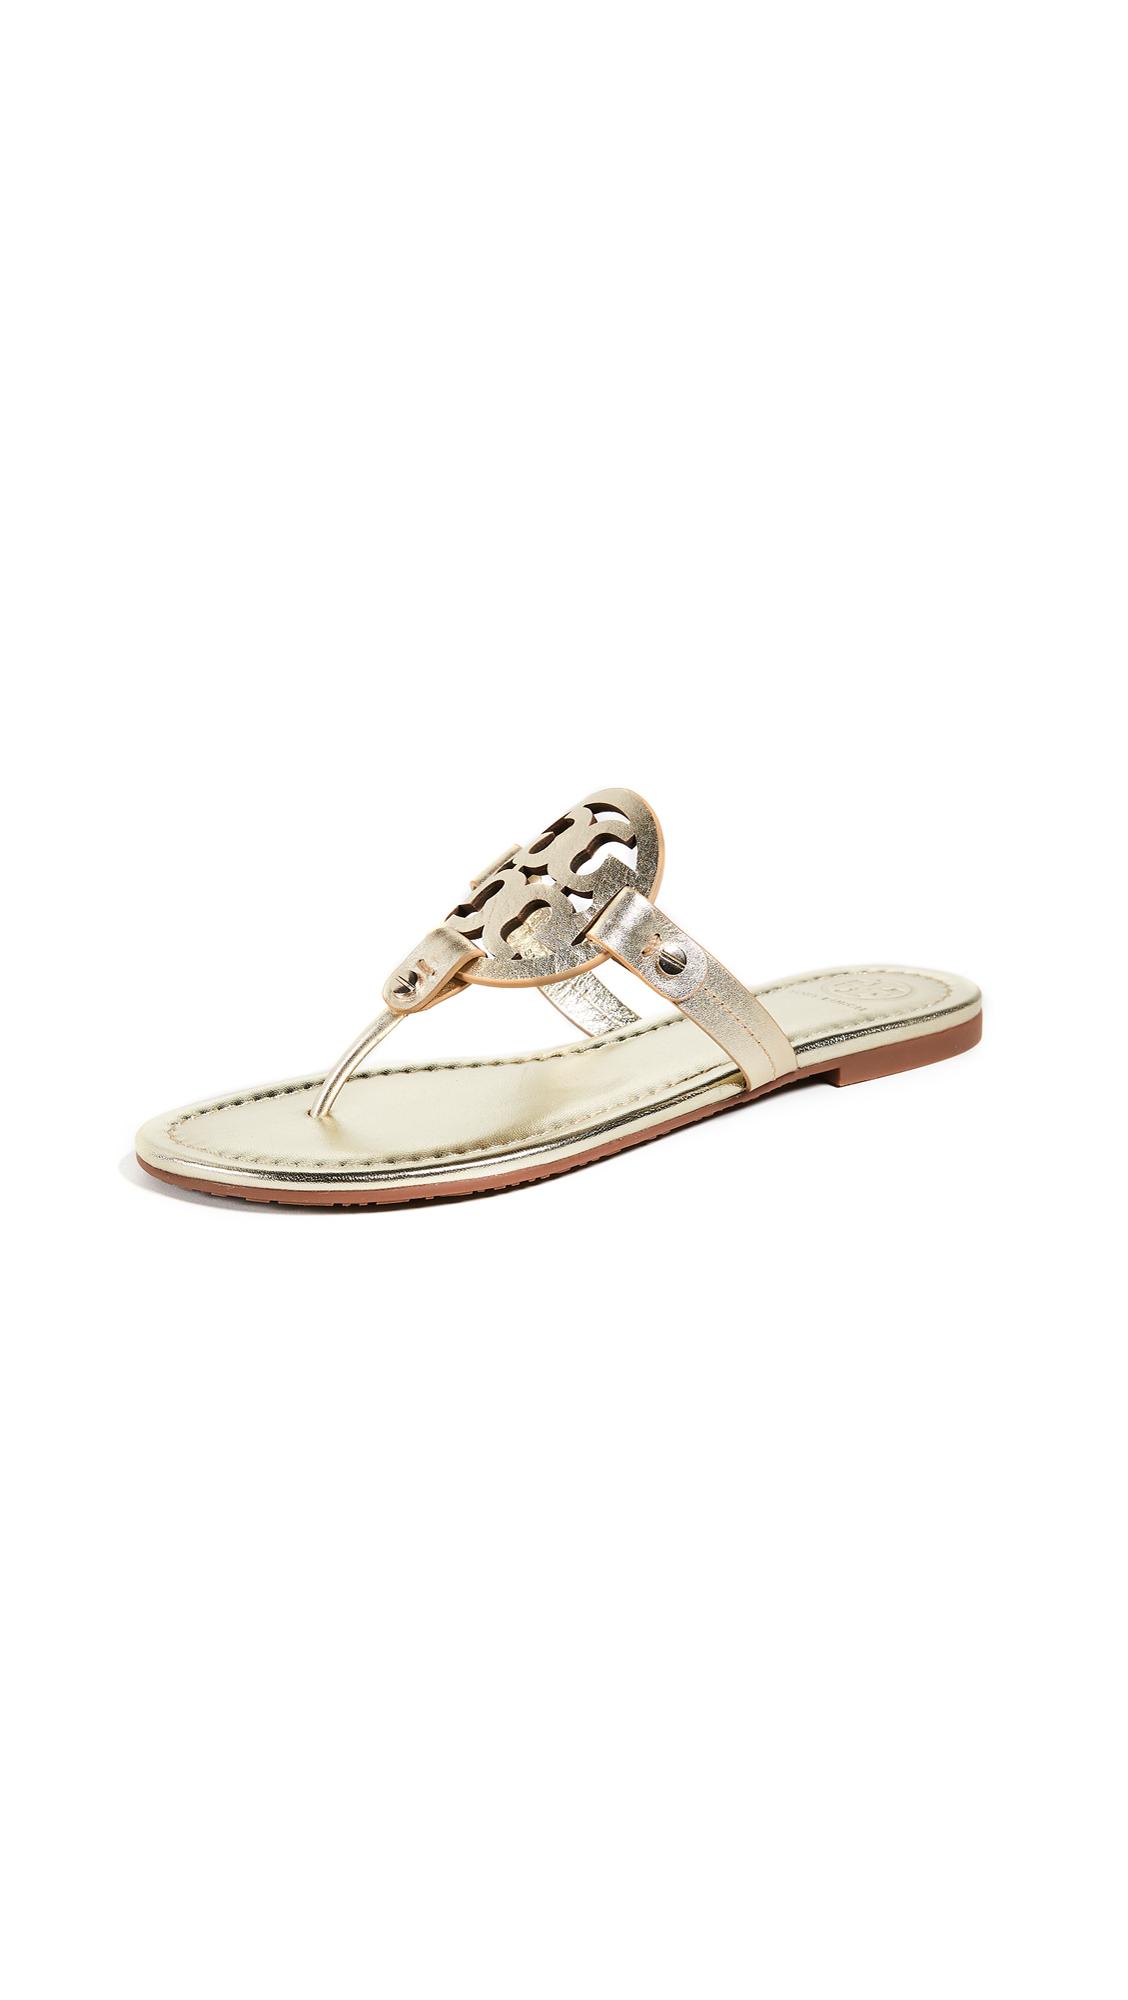 Tory Burch Miller Thong Sandals - Spark Gold